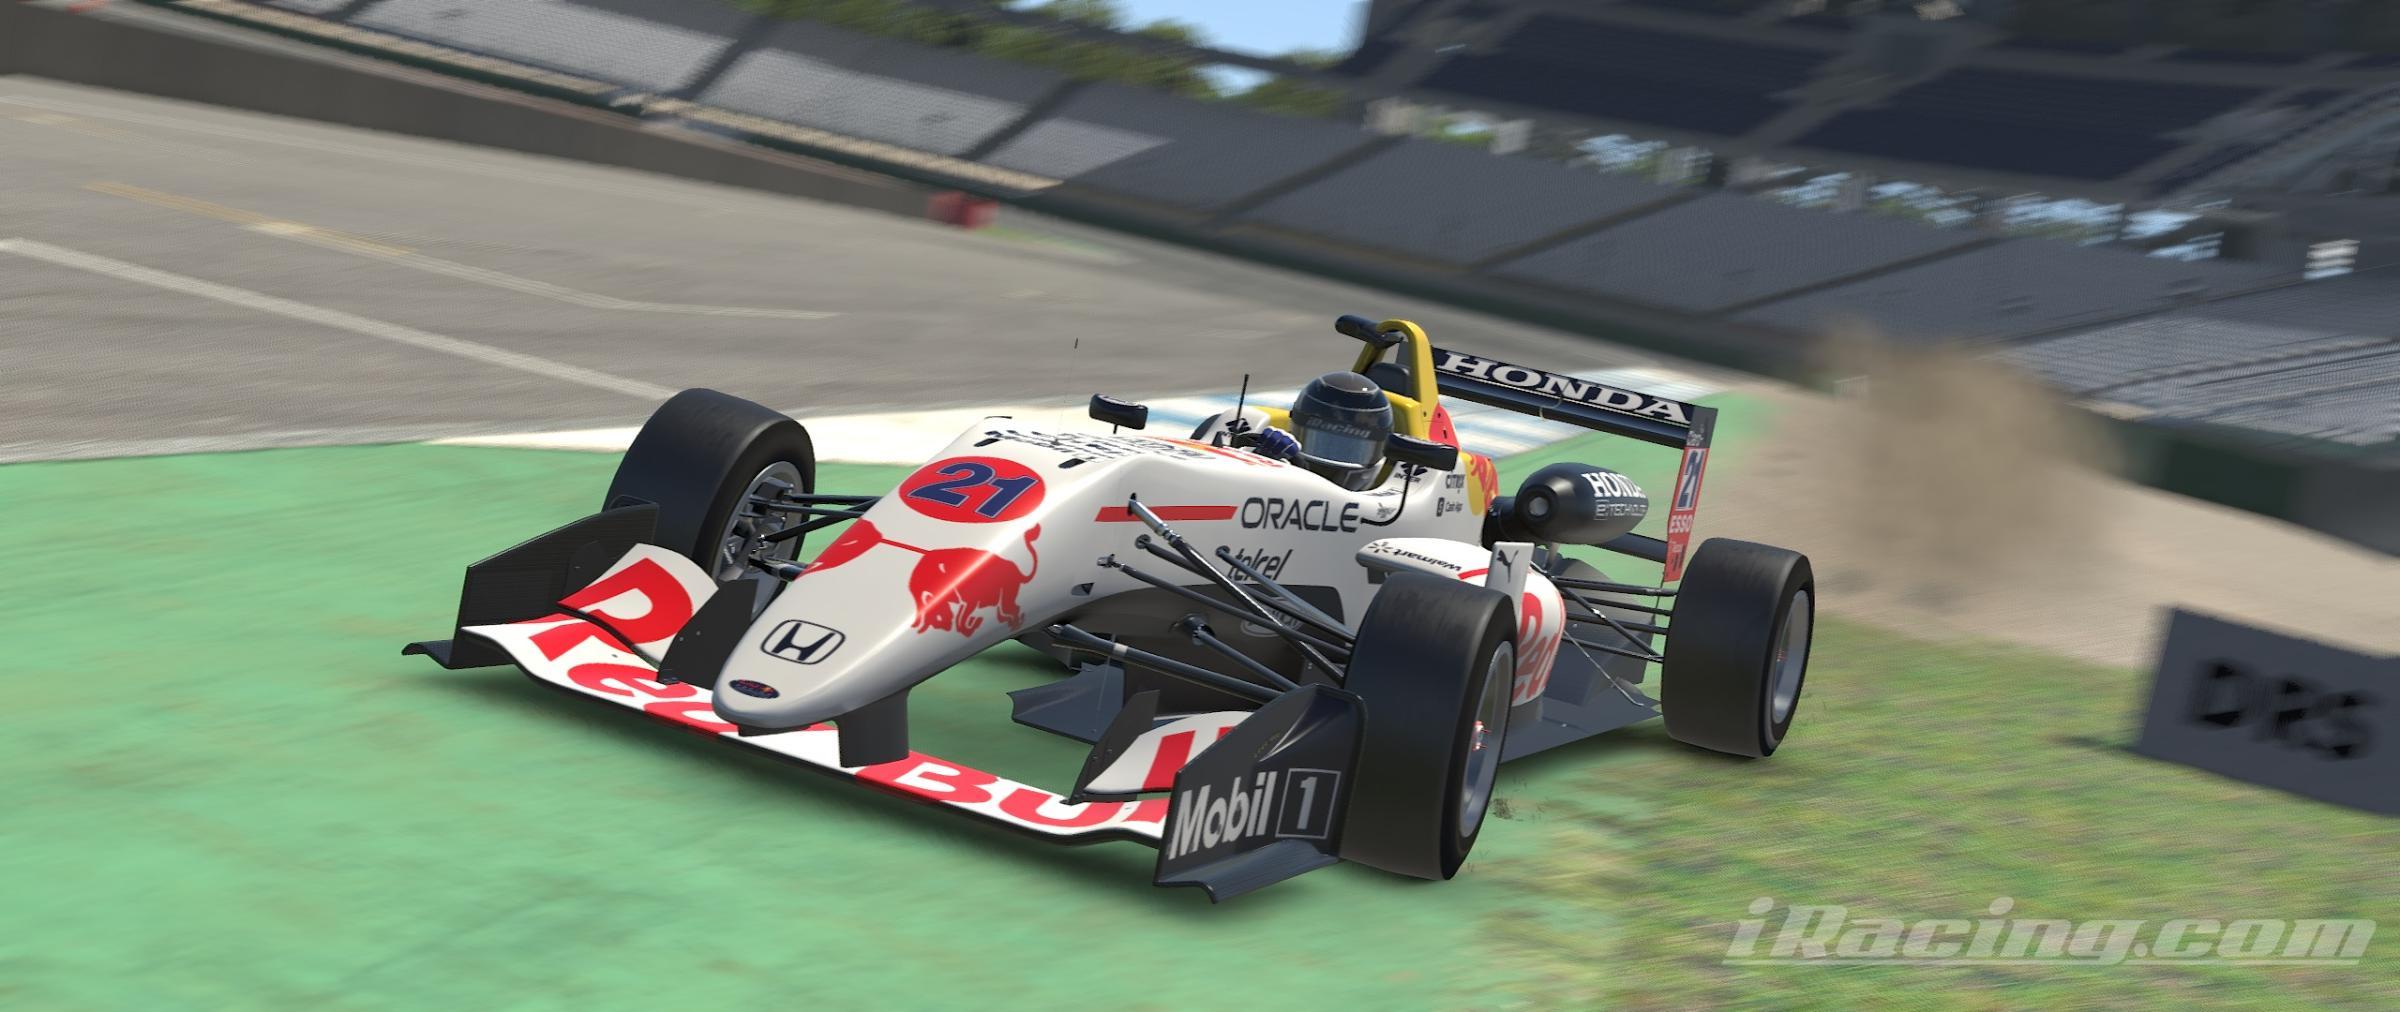 Preview of Red Bull Racing Honda RB16B White Edition / F3 by Noriyuki Mizuno